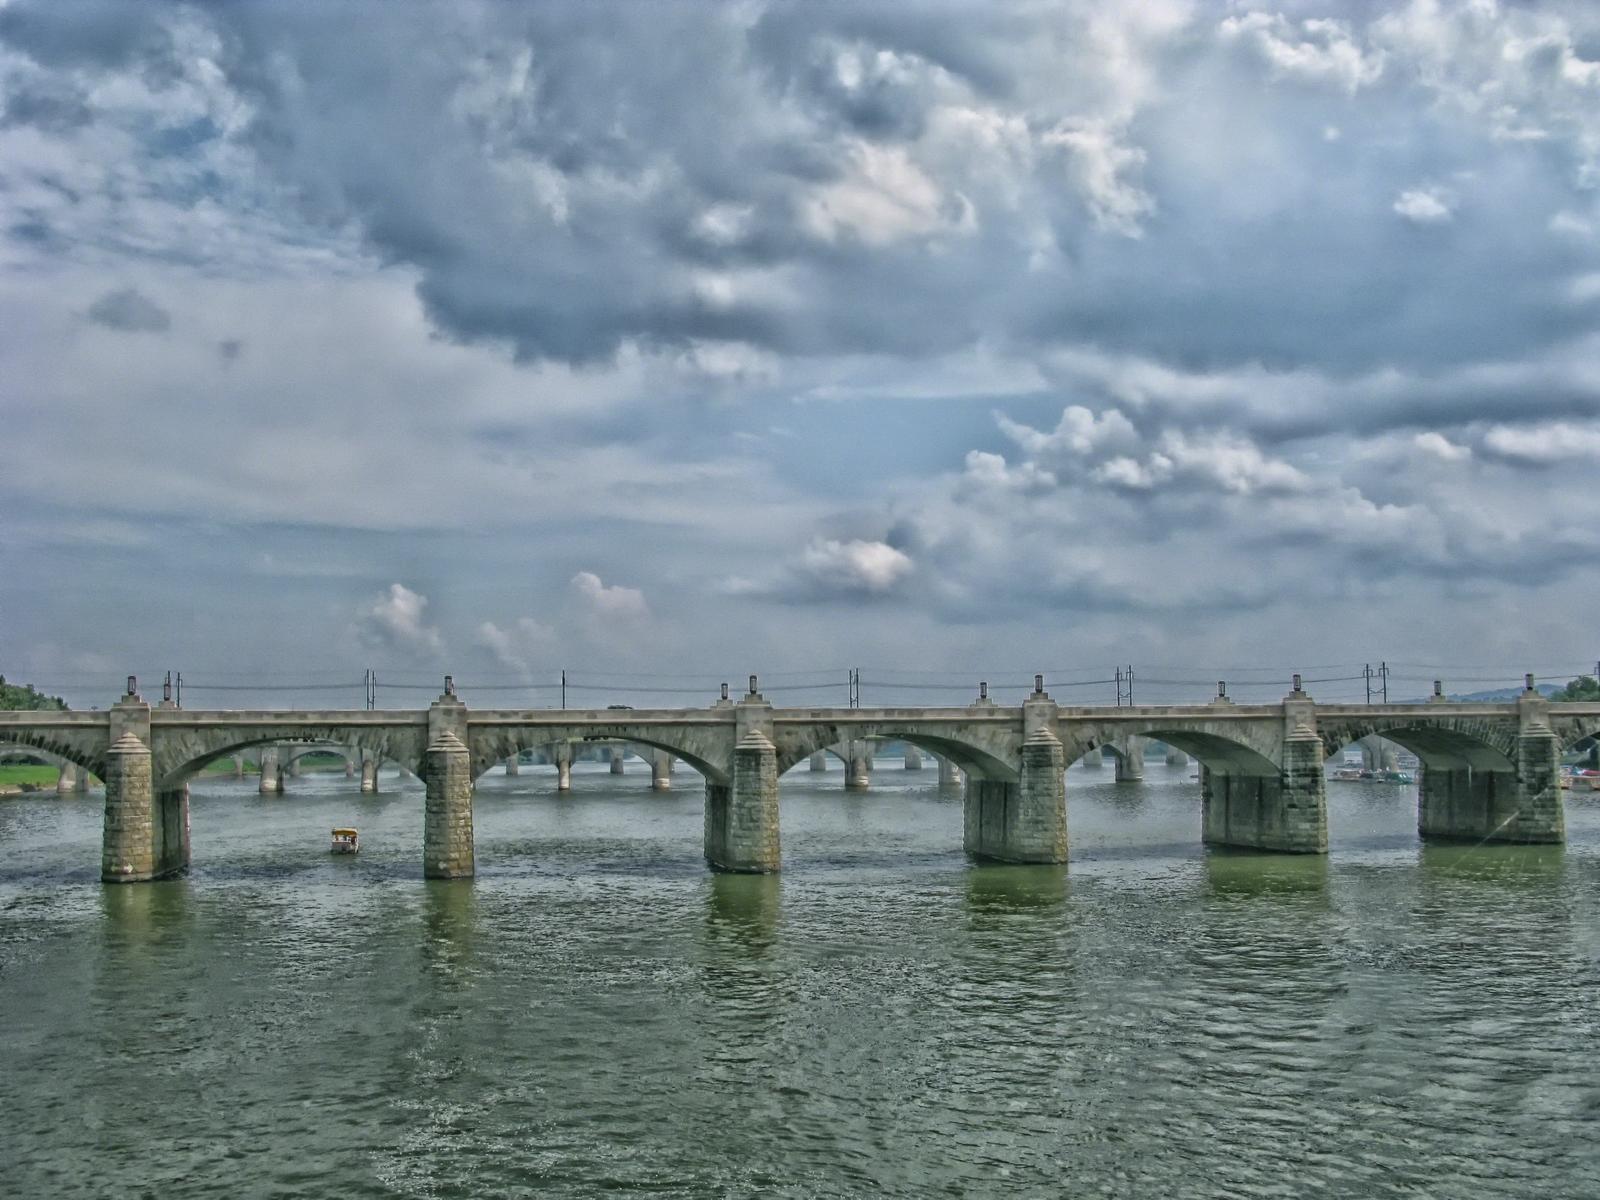 harrisburg, pennsylvania, bridges, susquehanna river, capital,, photo